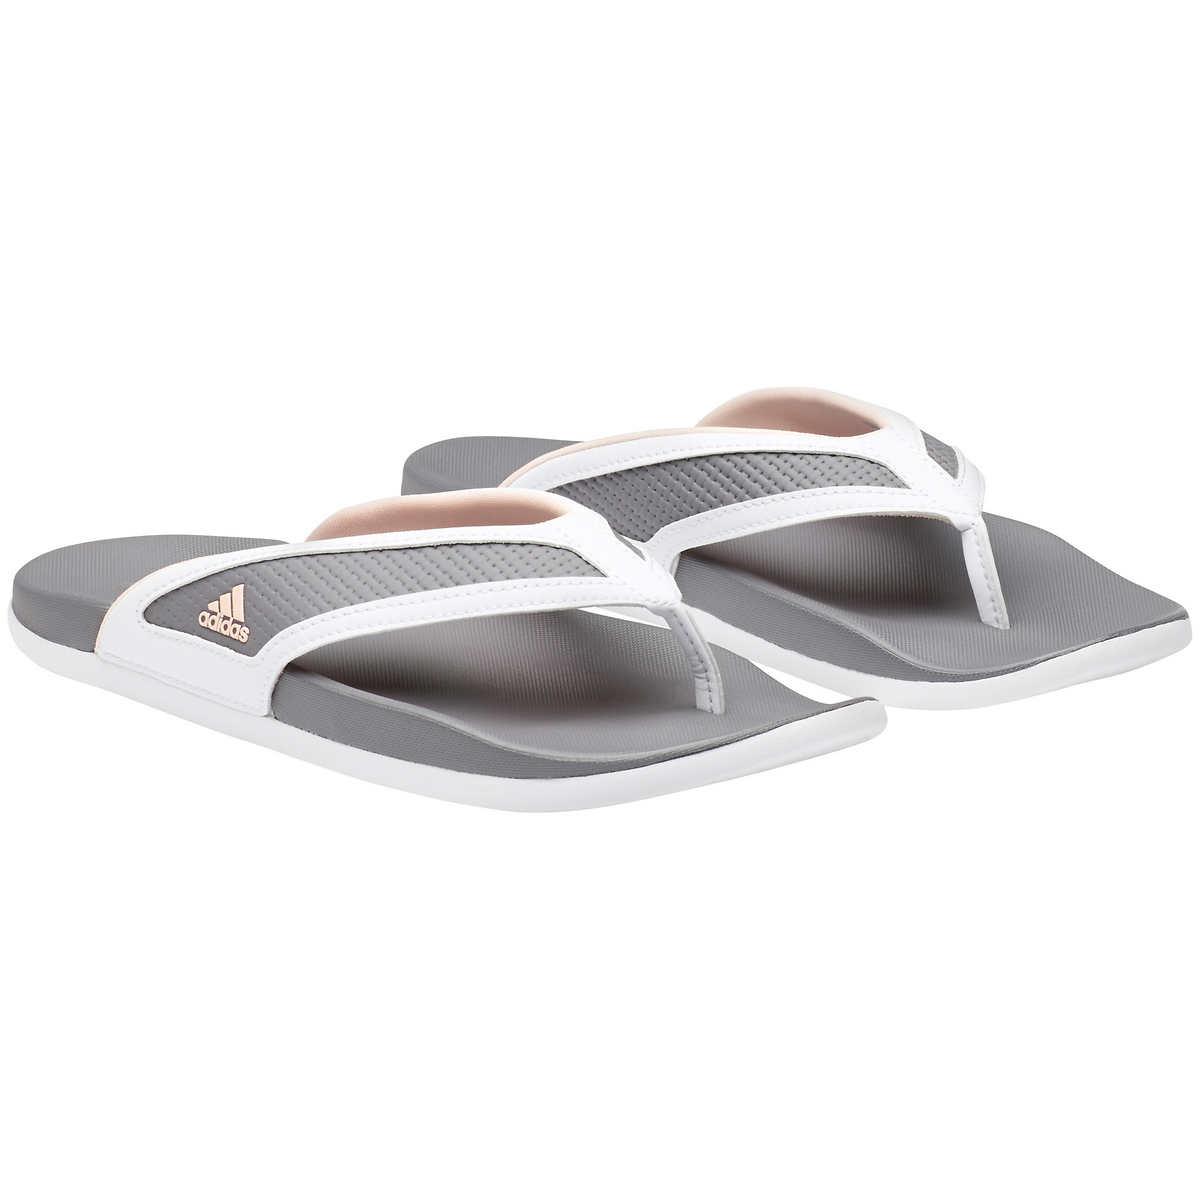 Costco: Adidas Ladies' Flip Flop Sandal + Free S&H, $14.99